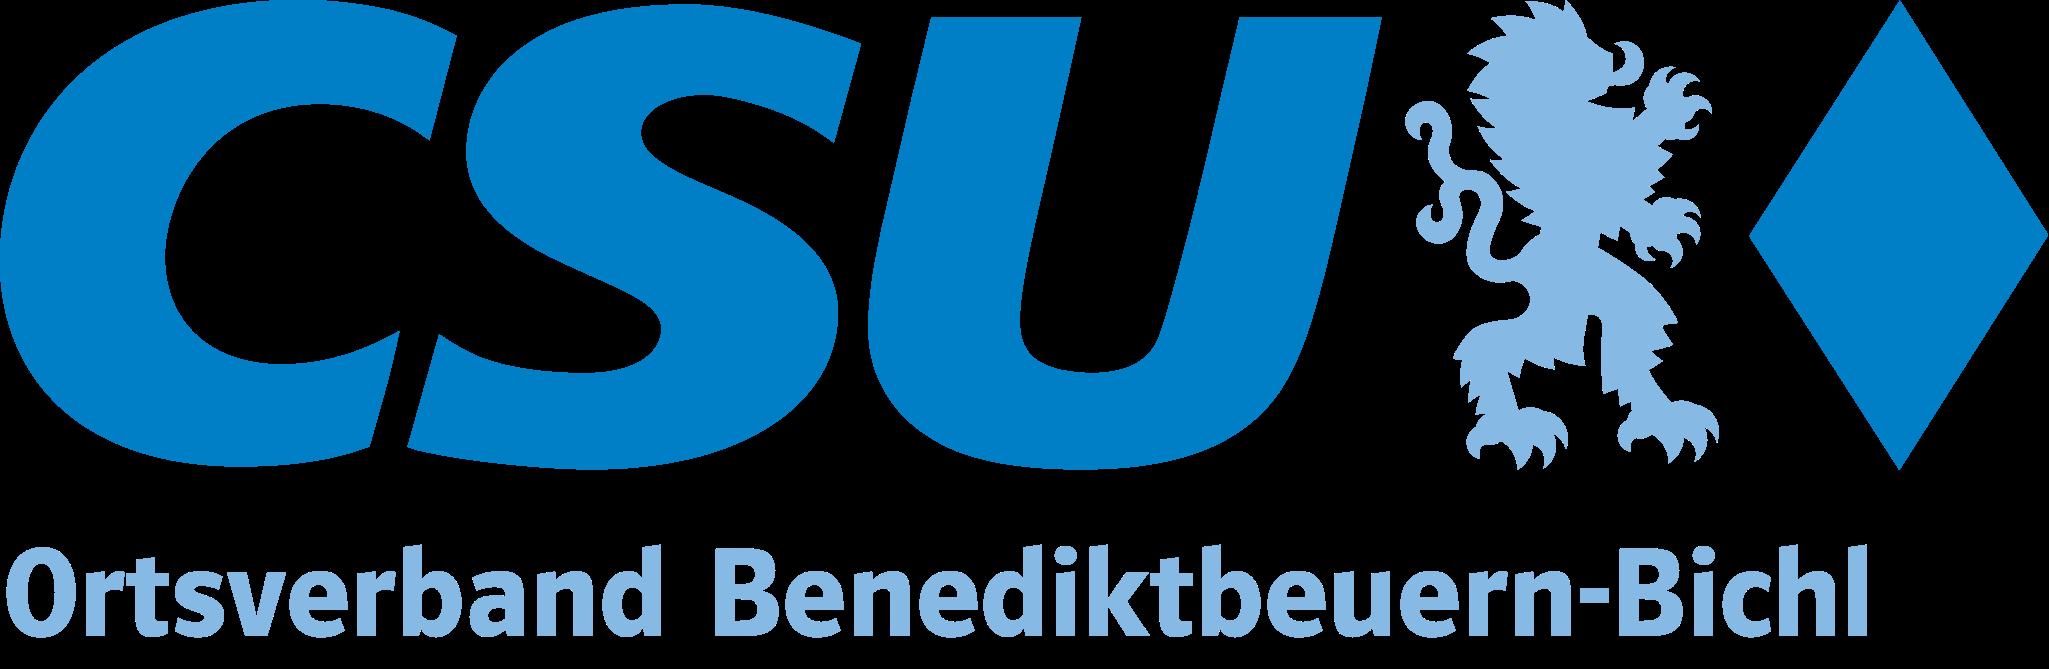 CSU Benediktbeuern-Bichl